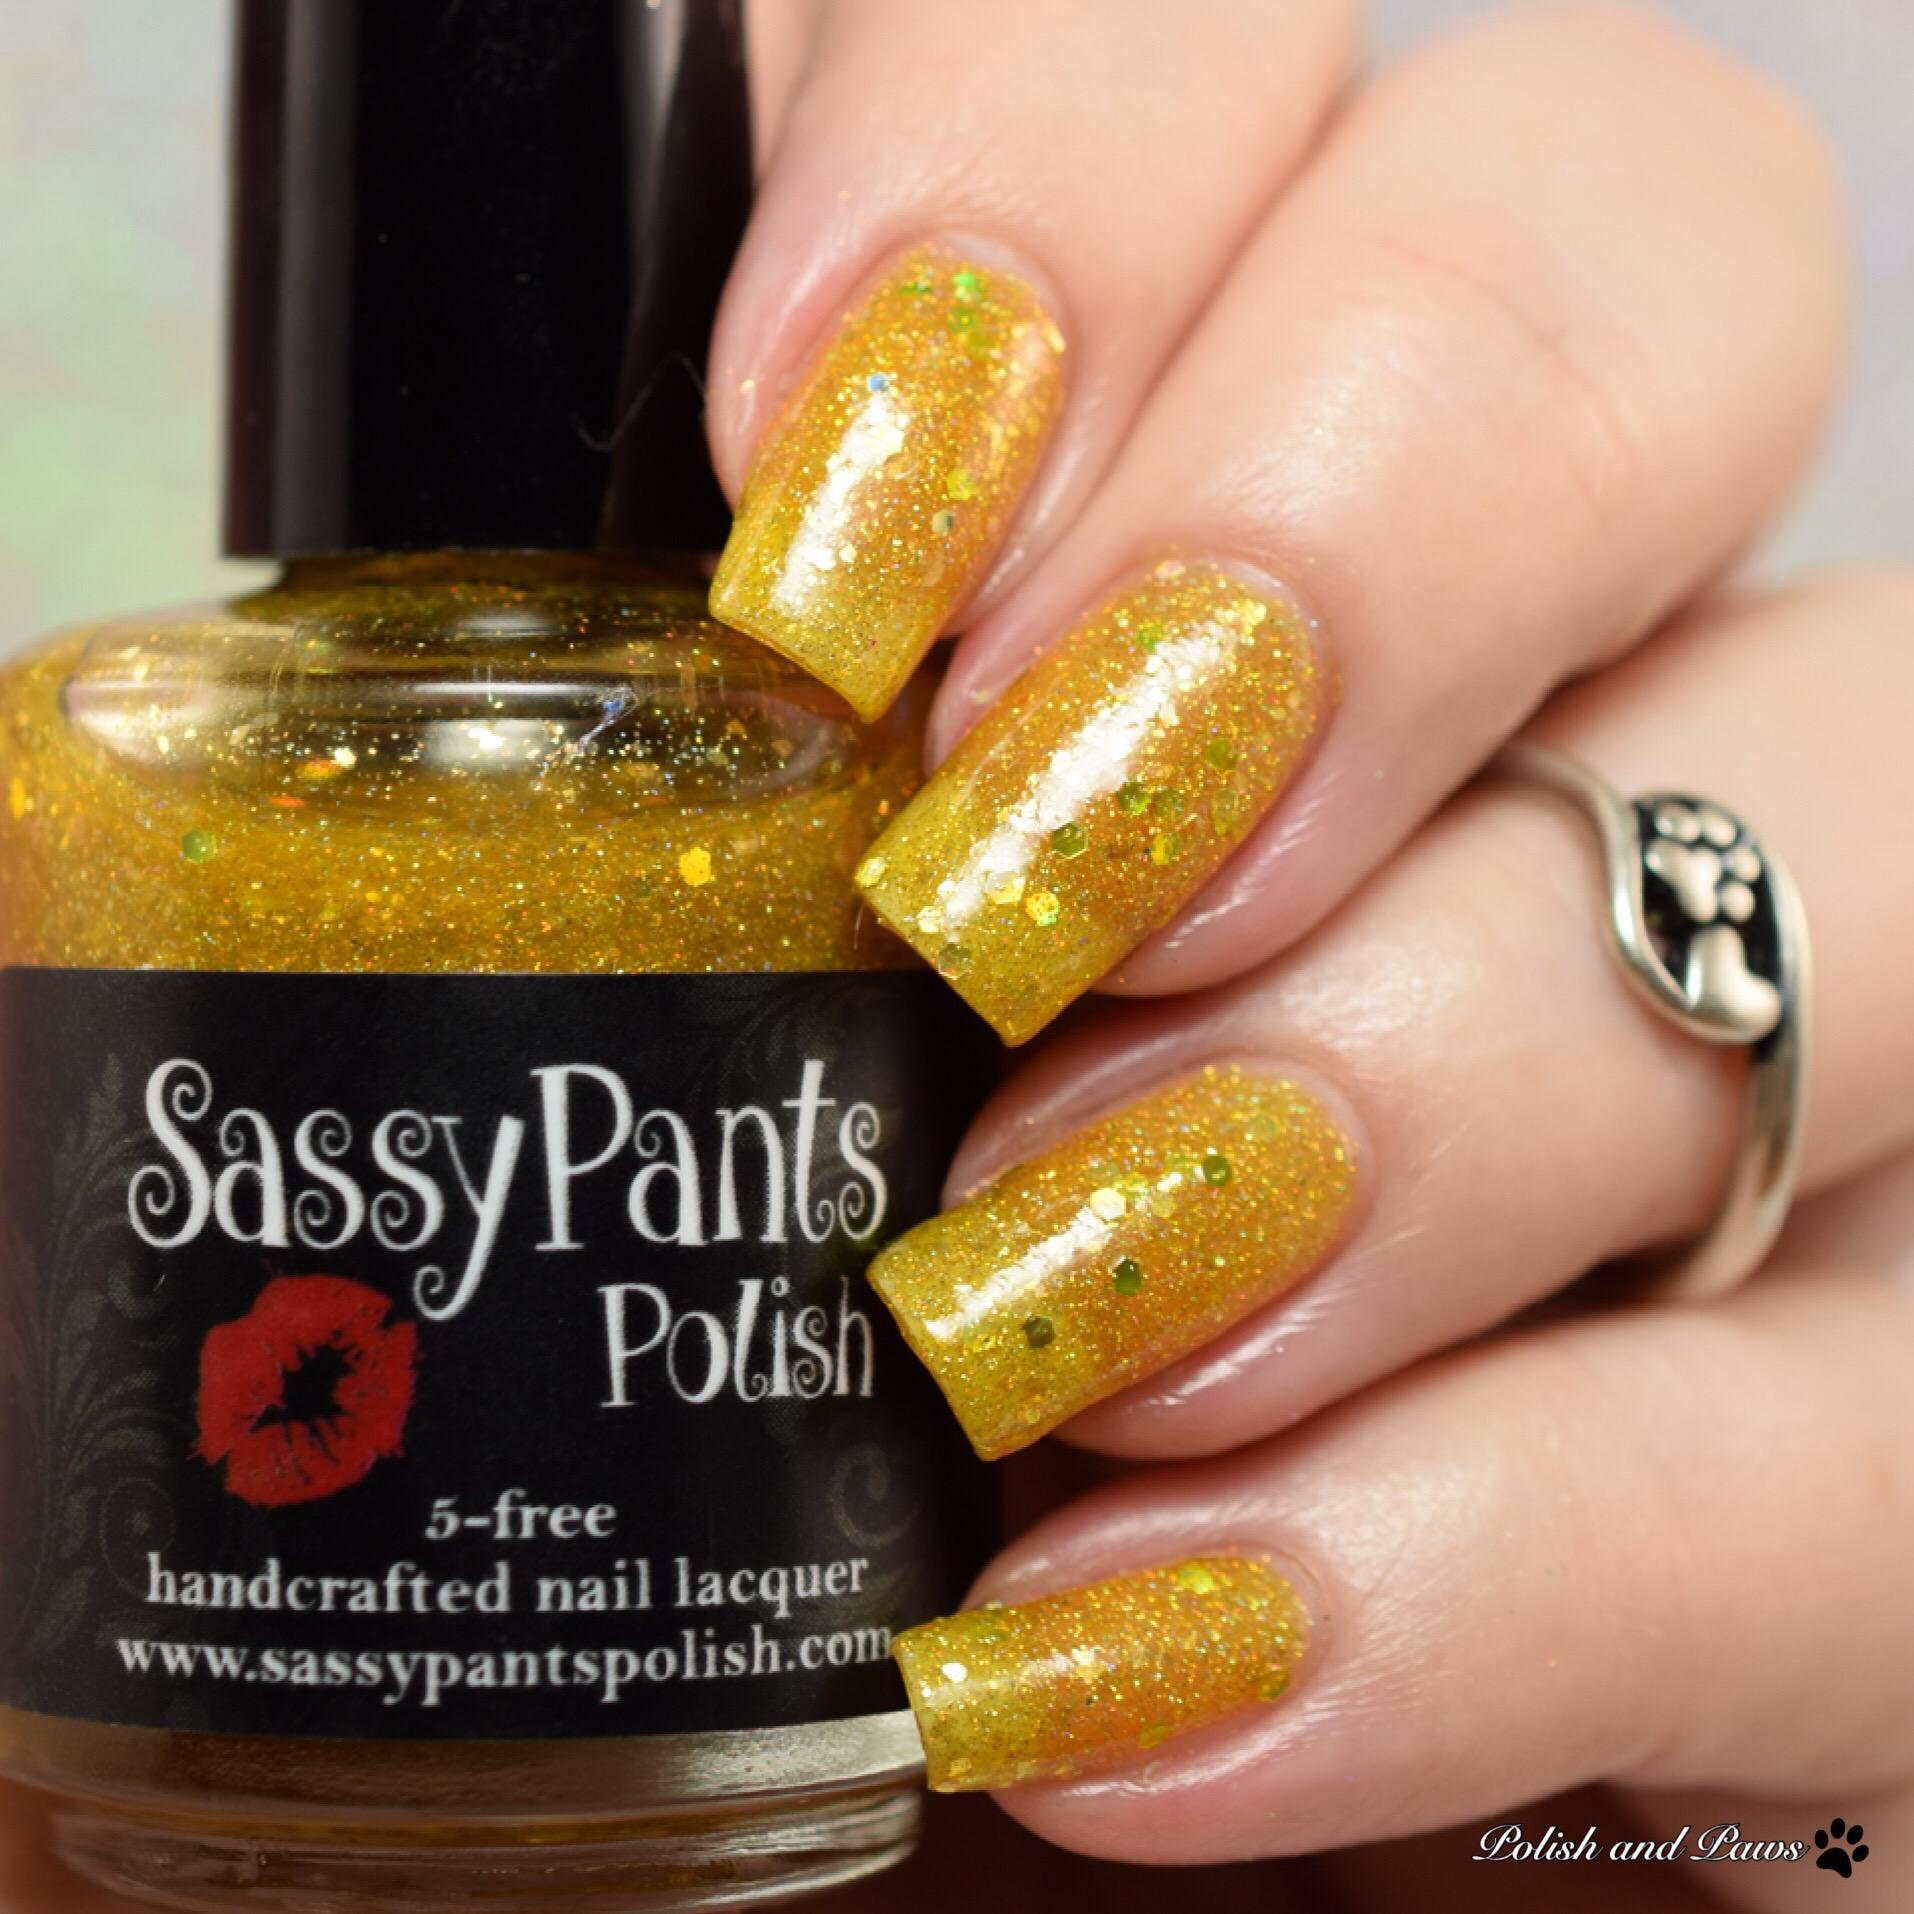 Sassy Pants Polish Lustre of Mid-Day